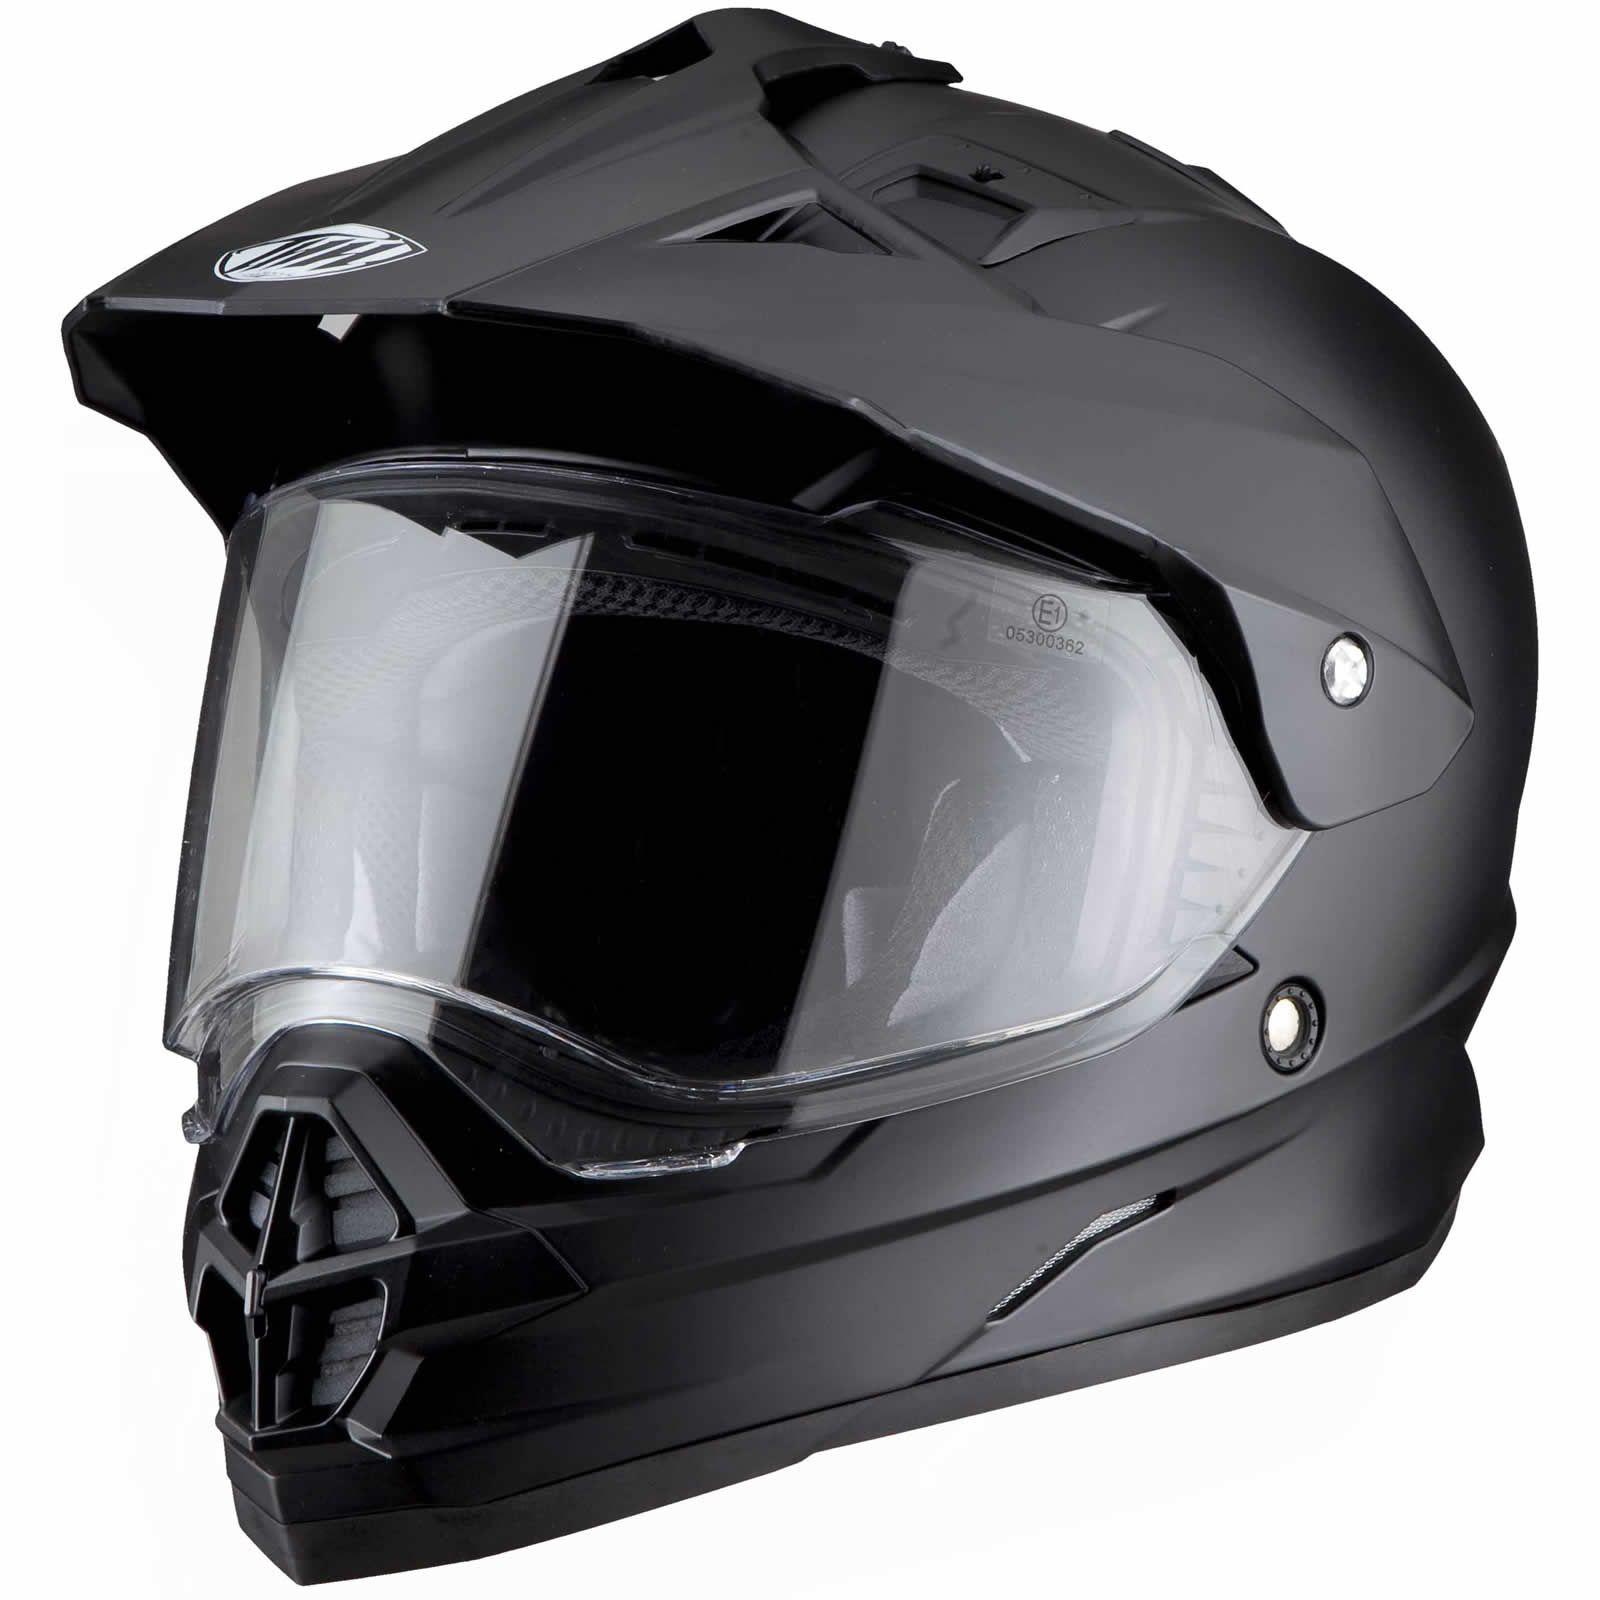 Dirt Bike Helmet With Visor >> Dirt Bike Helmet Visor Google Search Book Hawaii Toys And Stuff